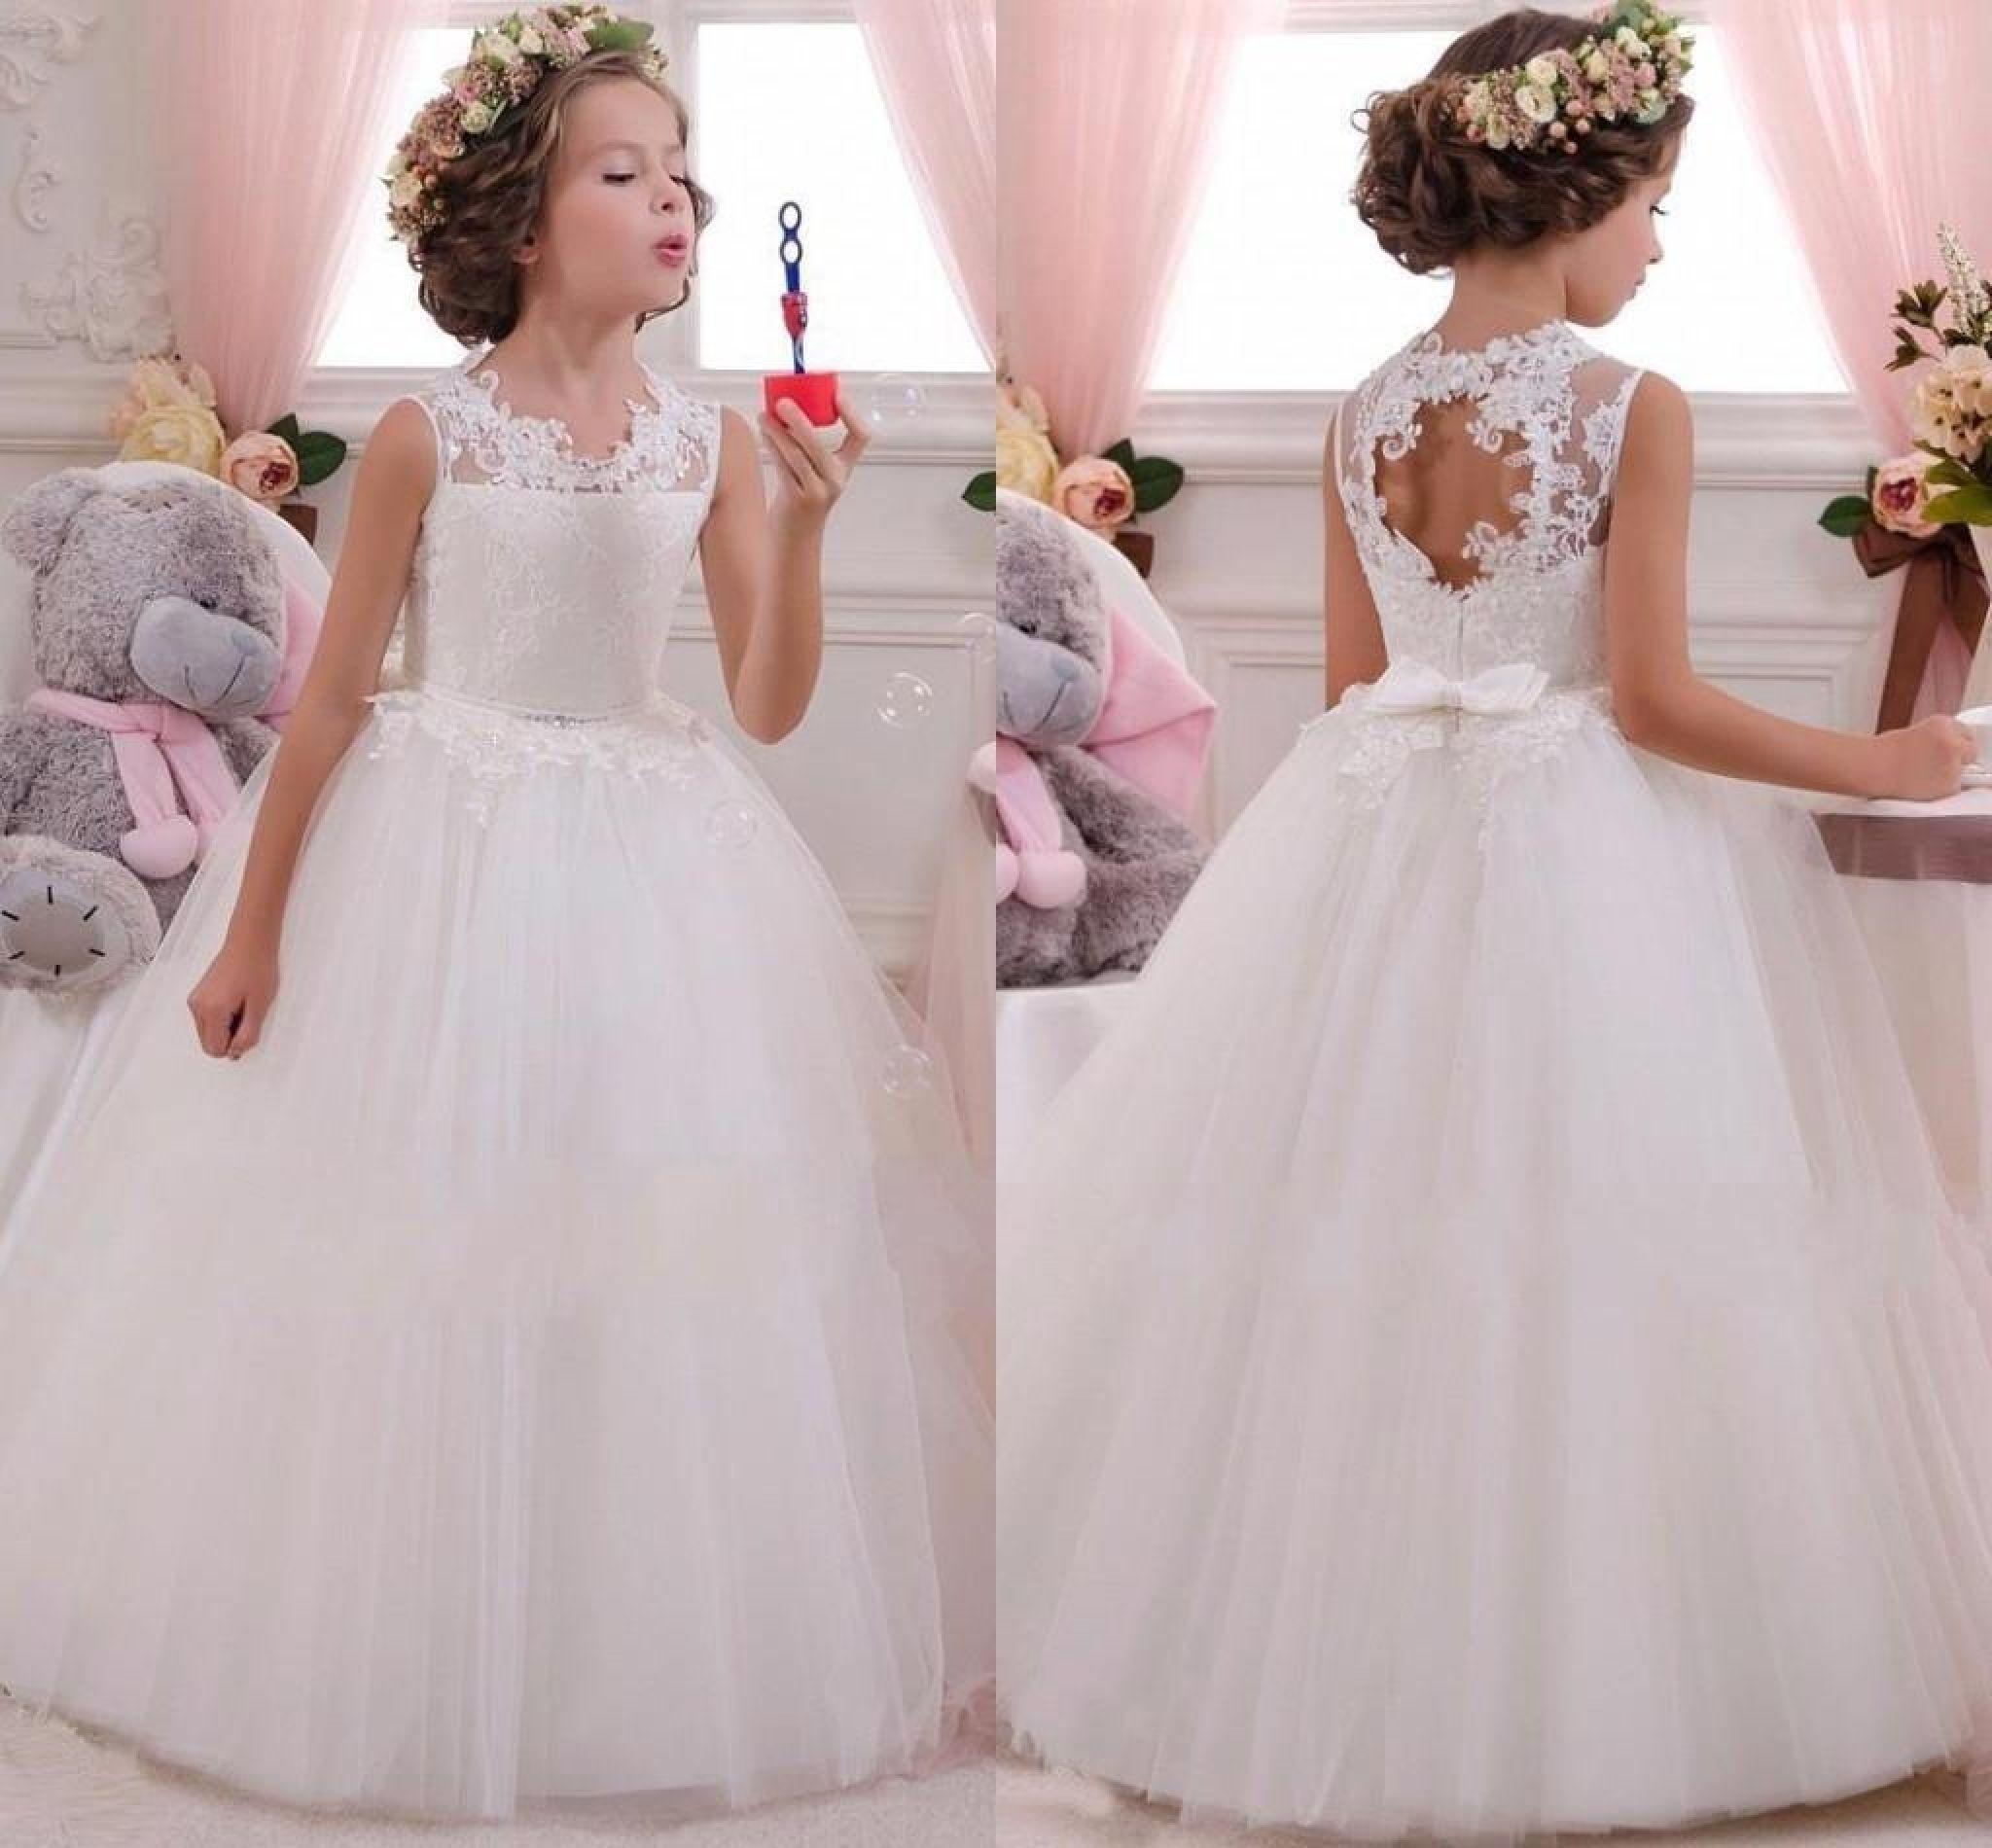 Girls wedding dress  wedding dresses for little girls  wedding dresses for the mature